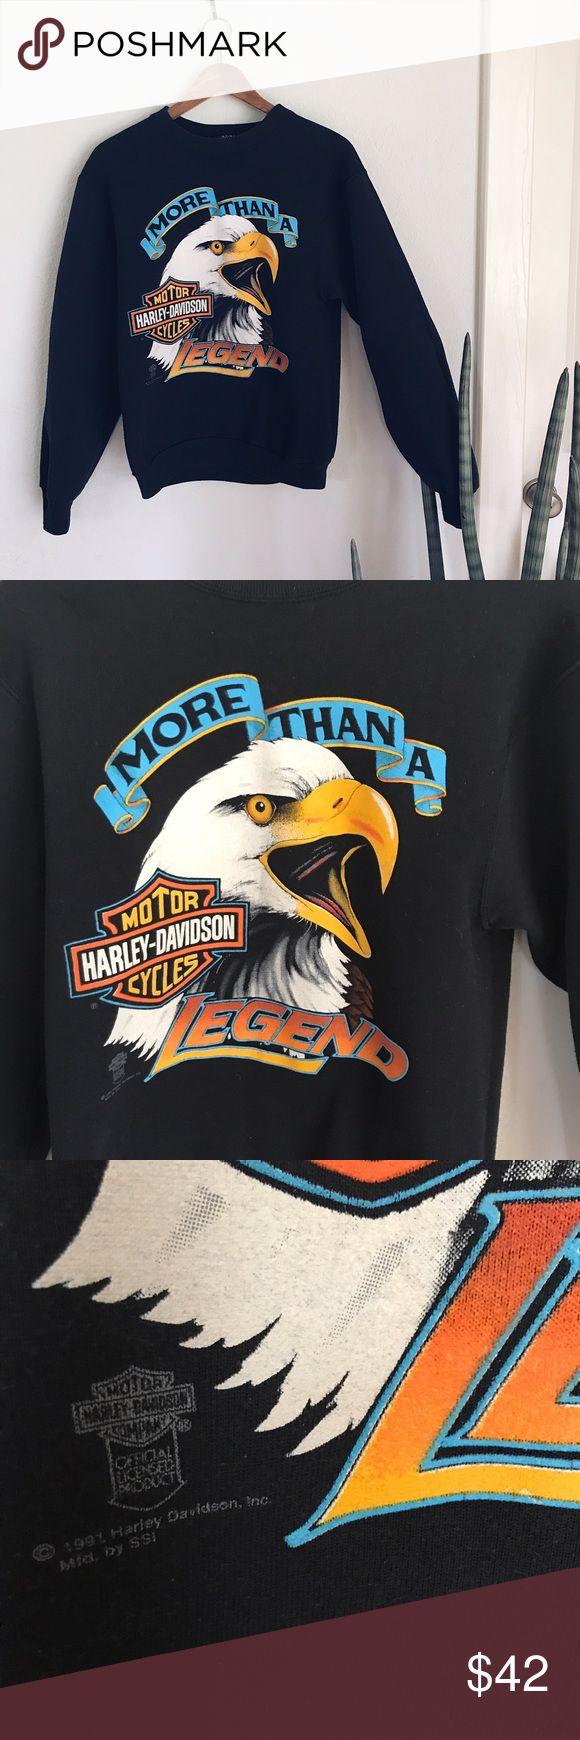 vintage harley davidson sweatshirt, Medium rad vintage 1991 harley sweatshirt for the badass babe! awesome condition, classic design. Tops Sweatshirts & Hoodies